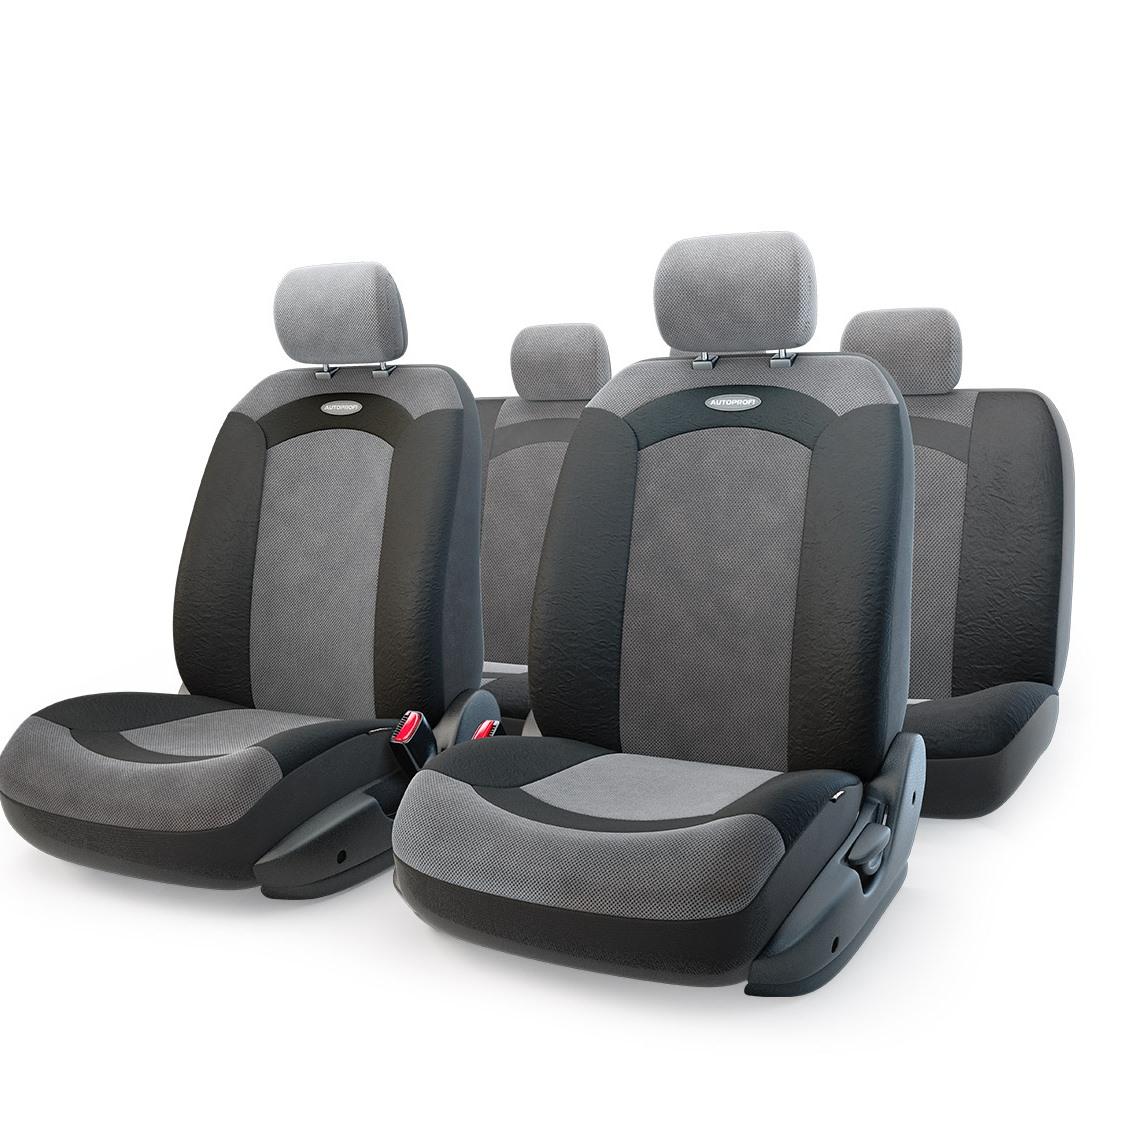 Чехол на сиденье Autoprofi Xtr-803 bk/bk (m) органайзер autoprofi org 10 bk